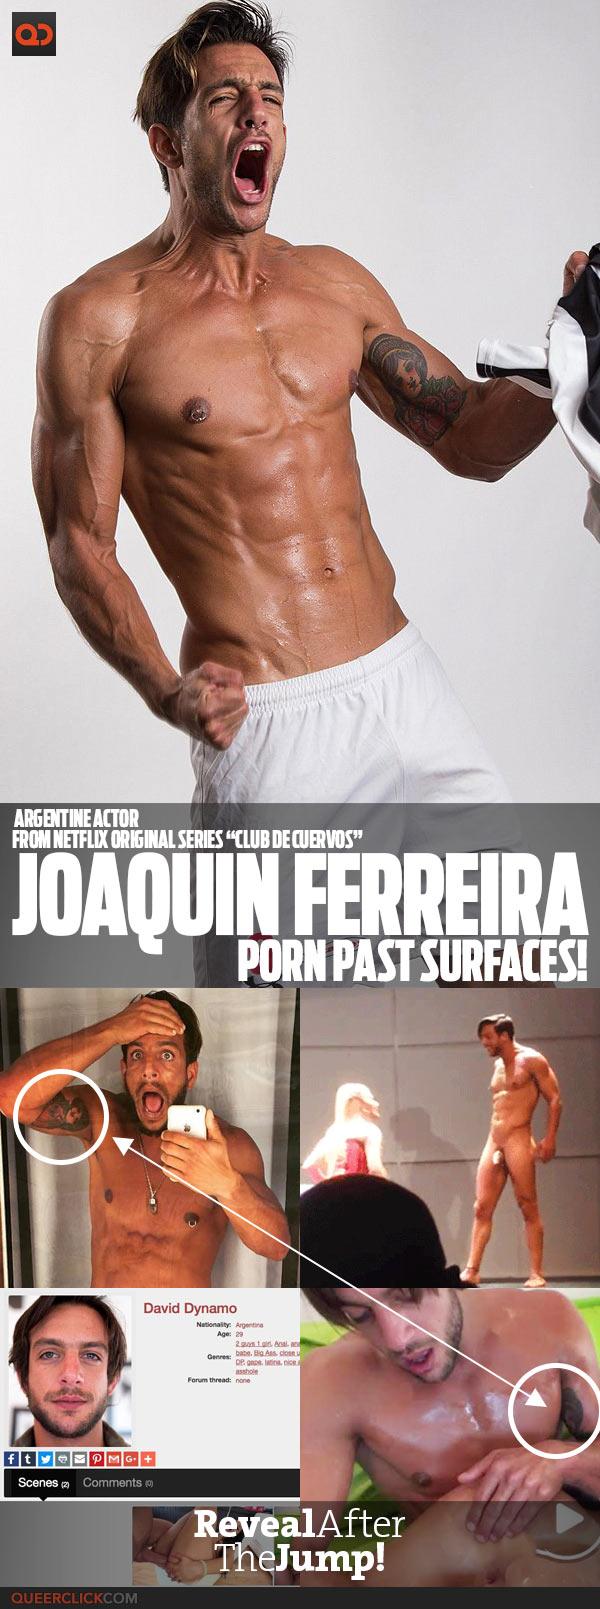 "Joaquín Ferreira, Argentine Actor From Netflix Original Series ""Club De Cuervos"", Porn Past Surfaces!"